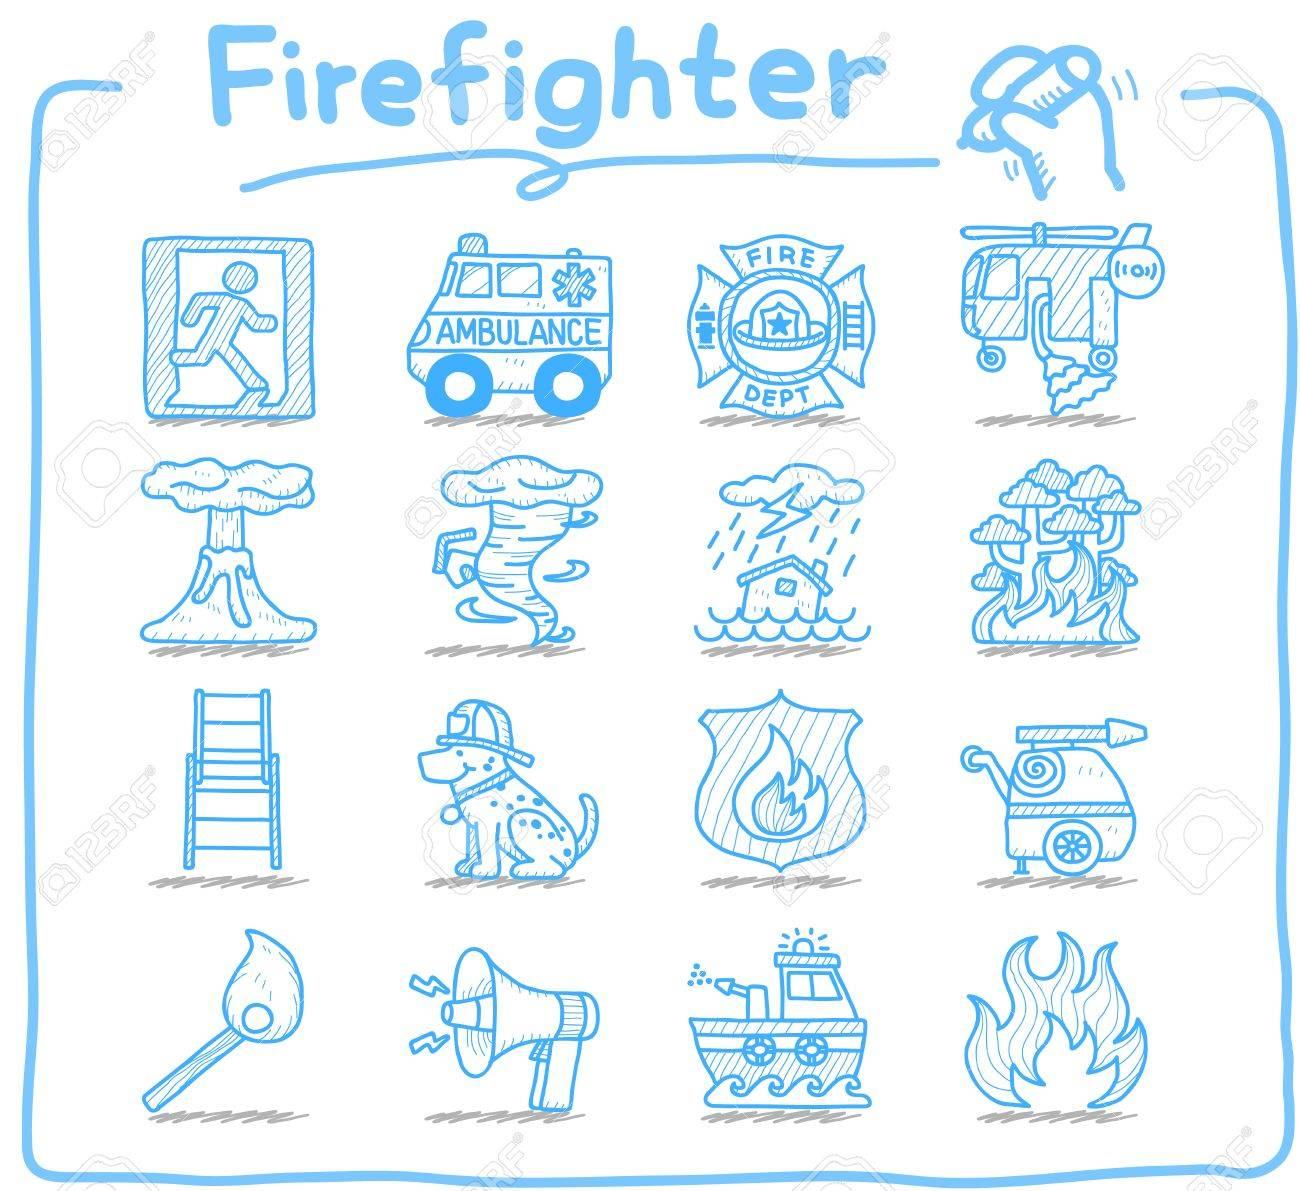 Hand drawn firefighter,fireman,emergency icon set Stock Vector - 12312021